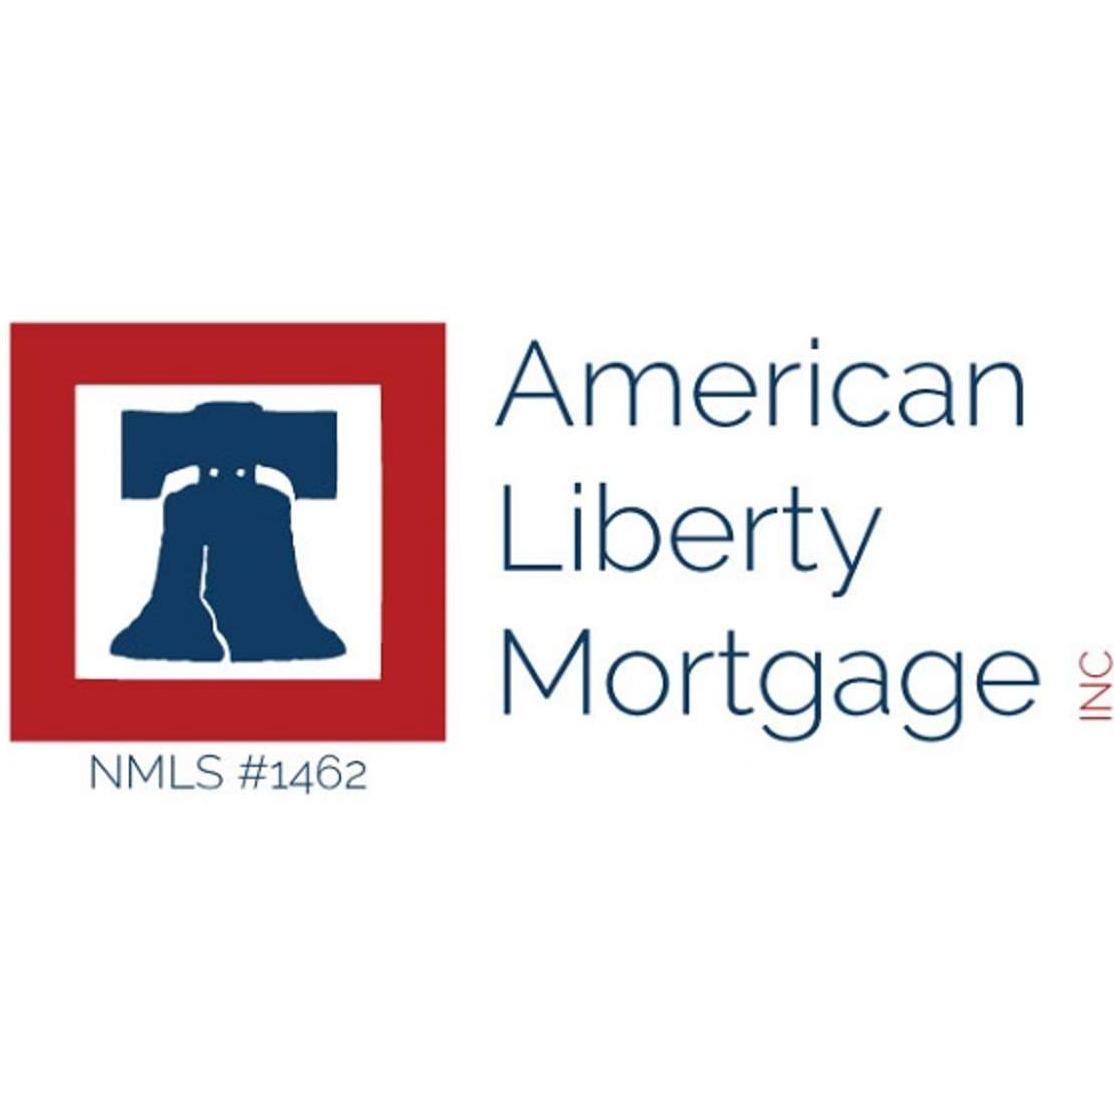 Britt Little | American Liberty Mortgage image 1